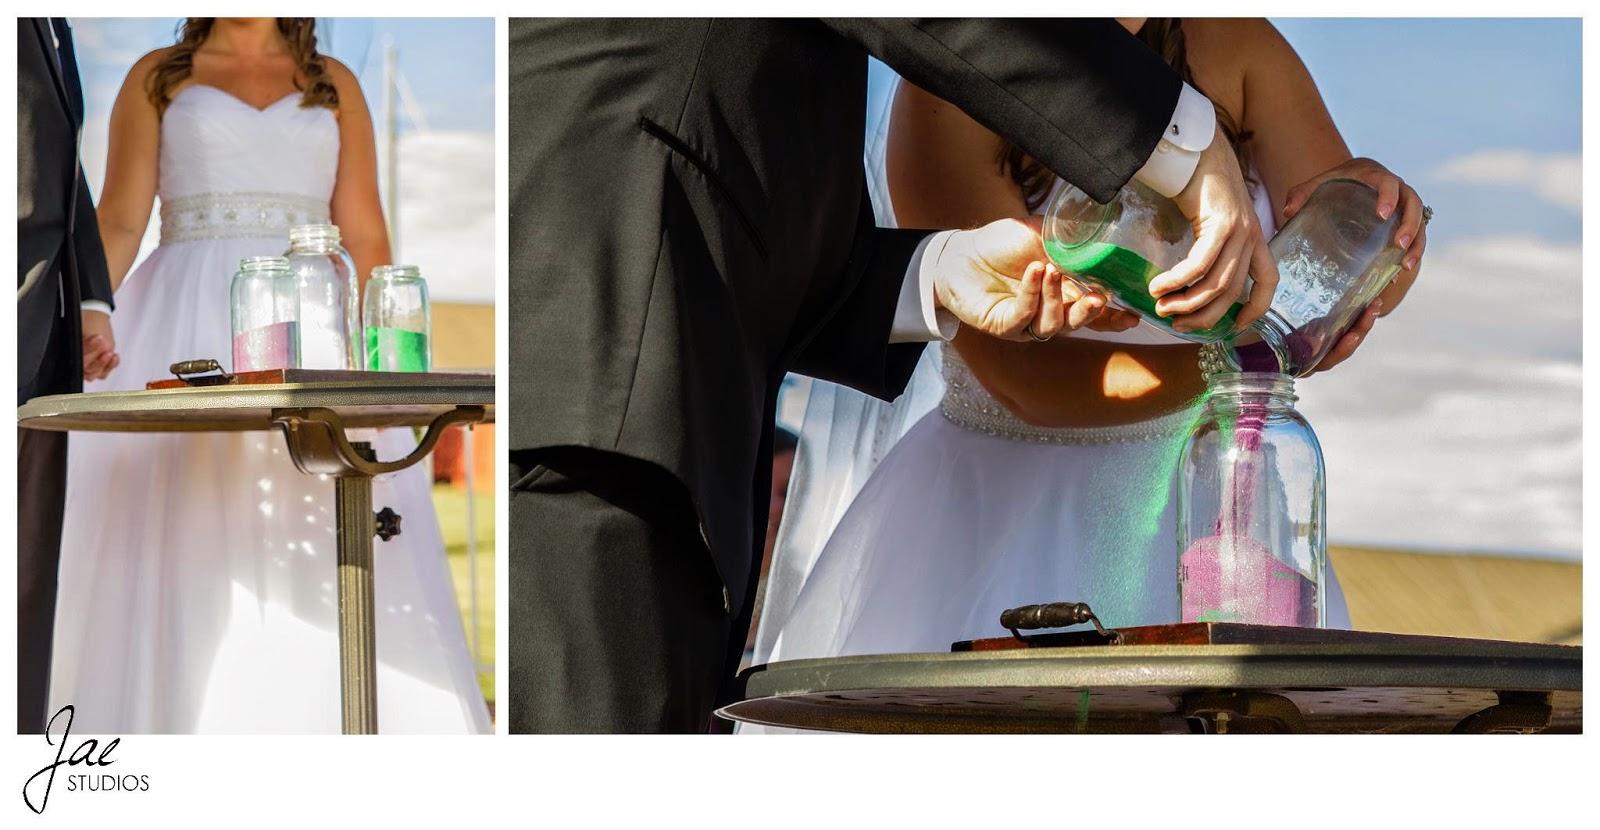 Jonathan and Julie, Bird cage, West Manor Estate, Wedding, Lynchburg, Virginia, Jae Studios, sand, green, pink, mason jars, wedding dress, tuxedo, pouring, unity, ceremony